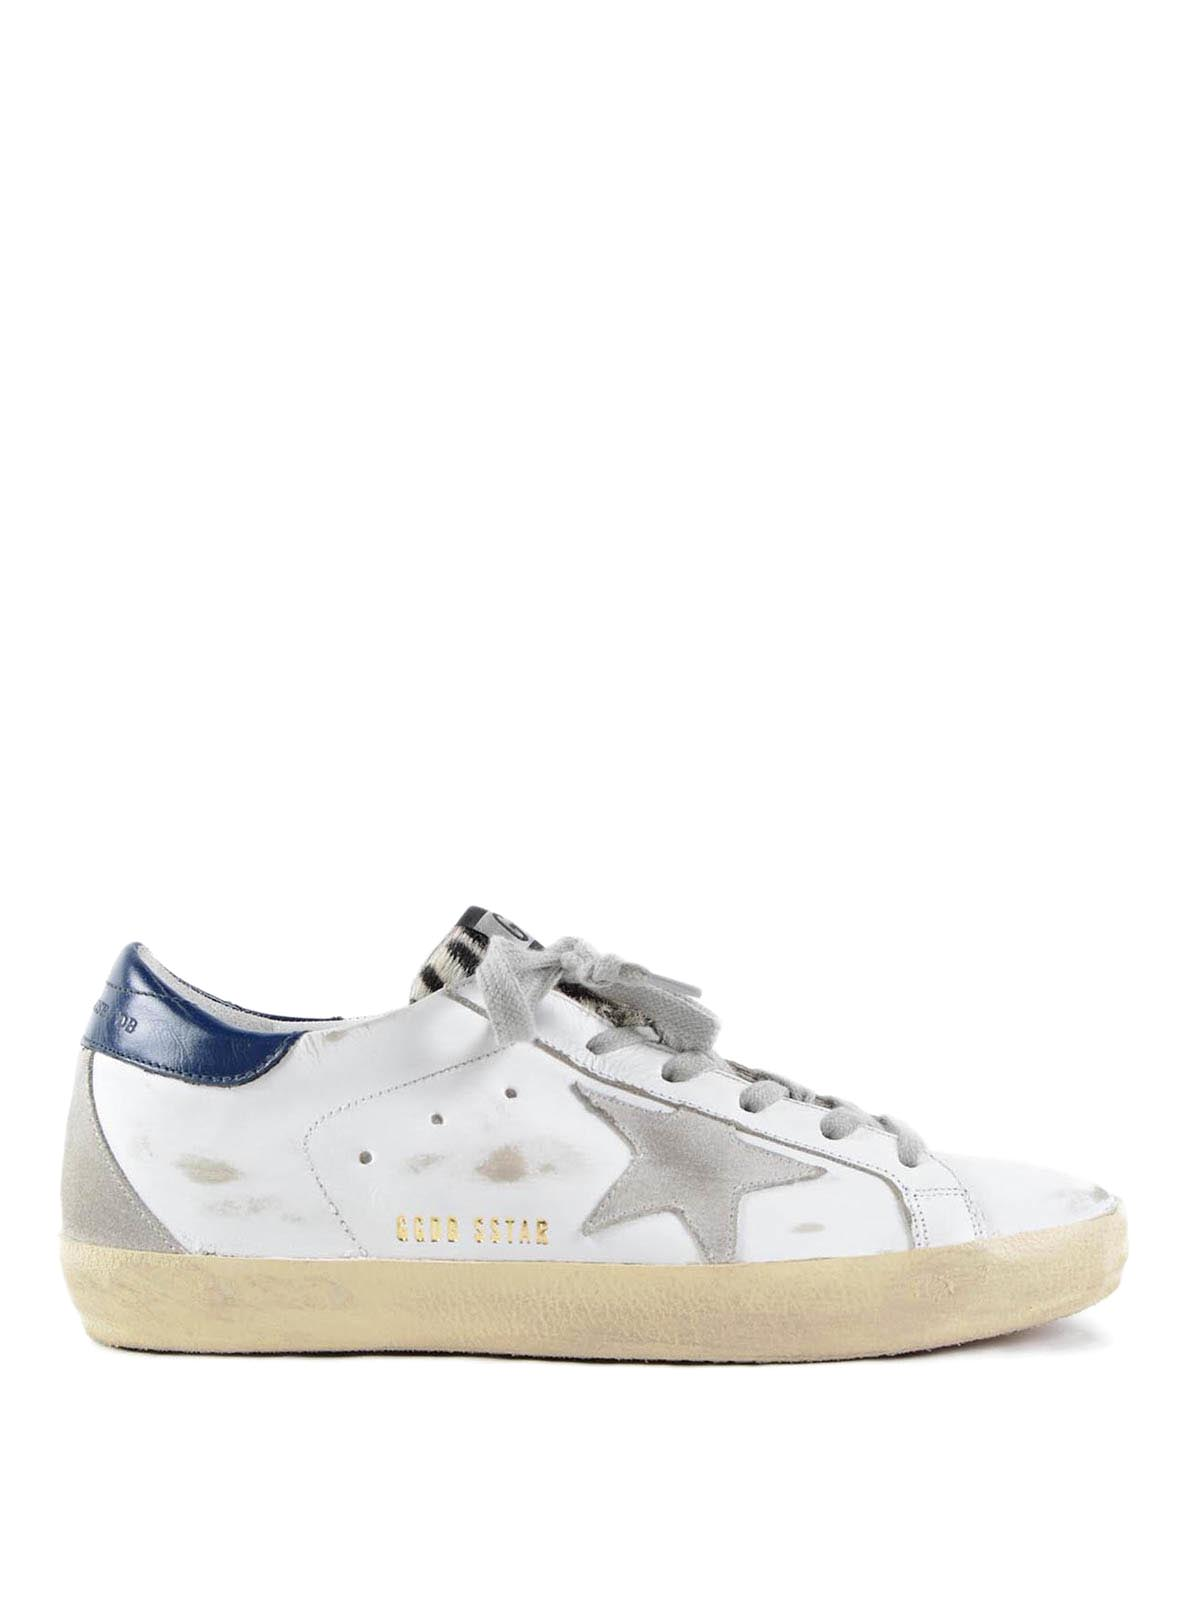 Off White Valentino Shoes